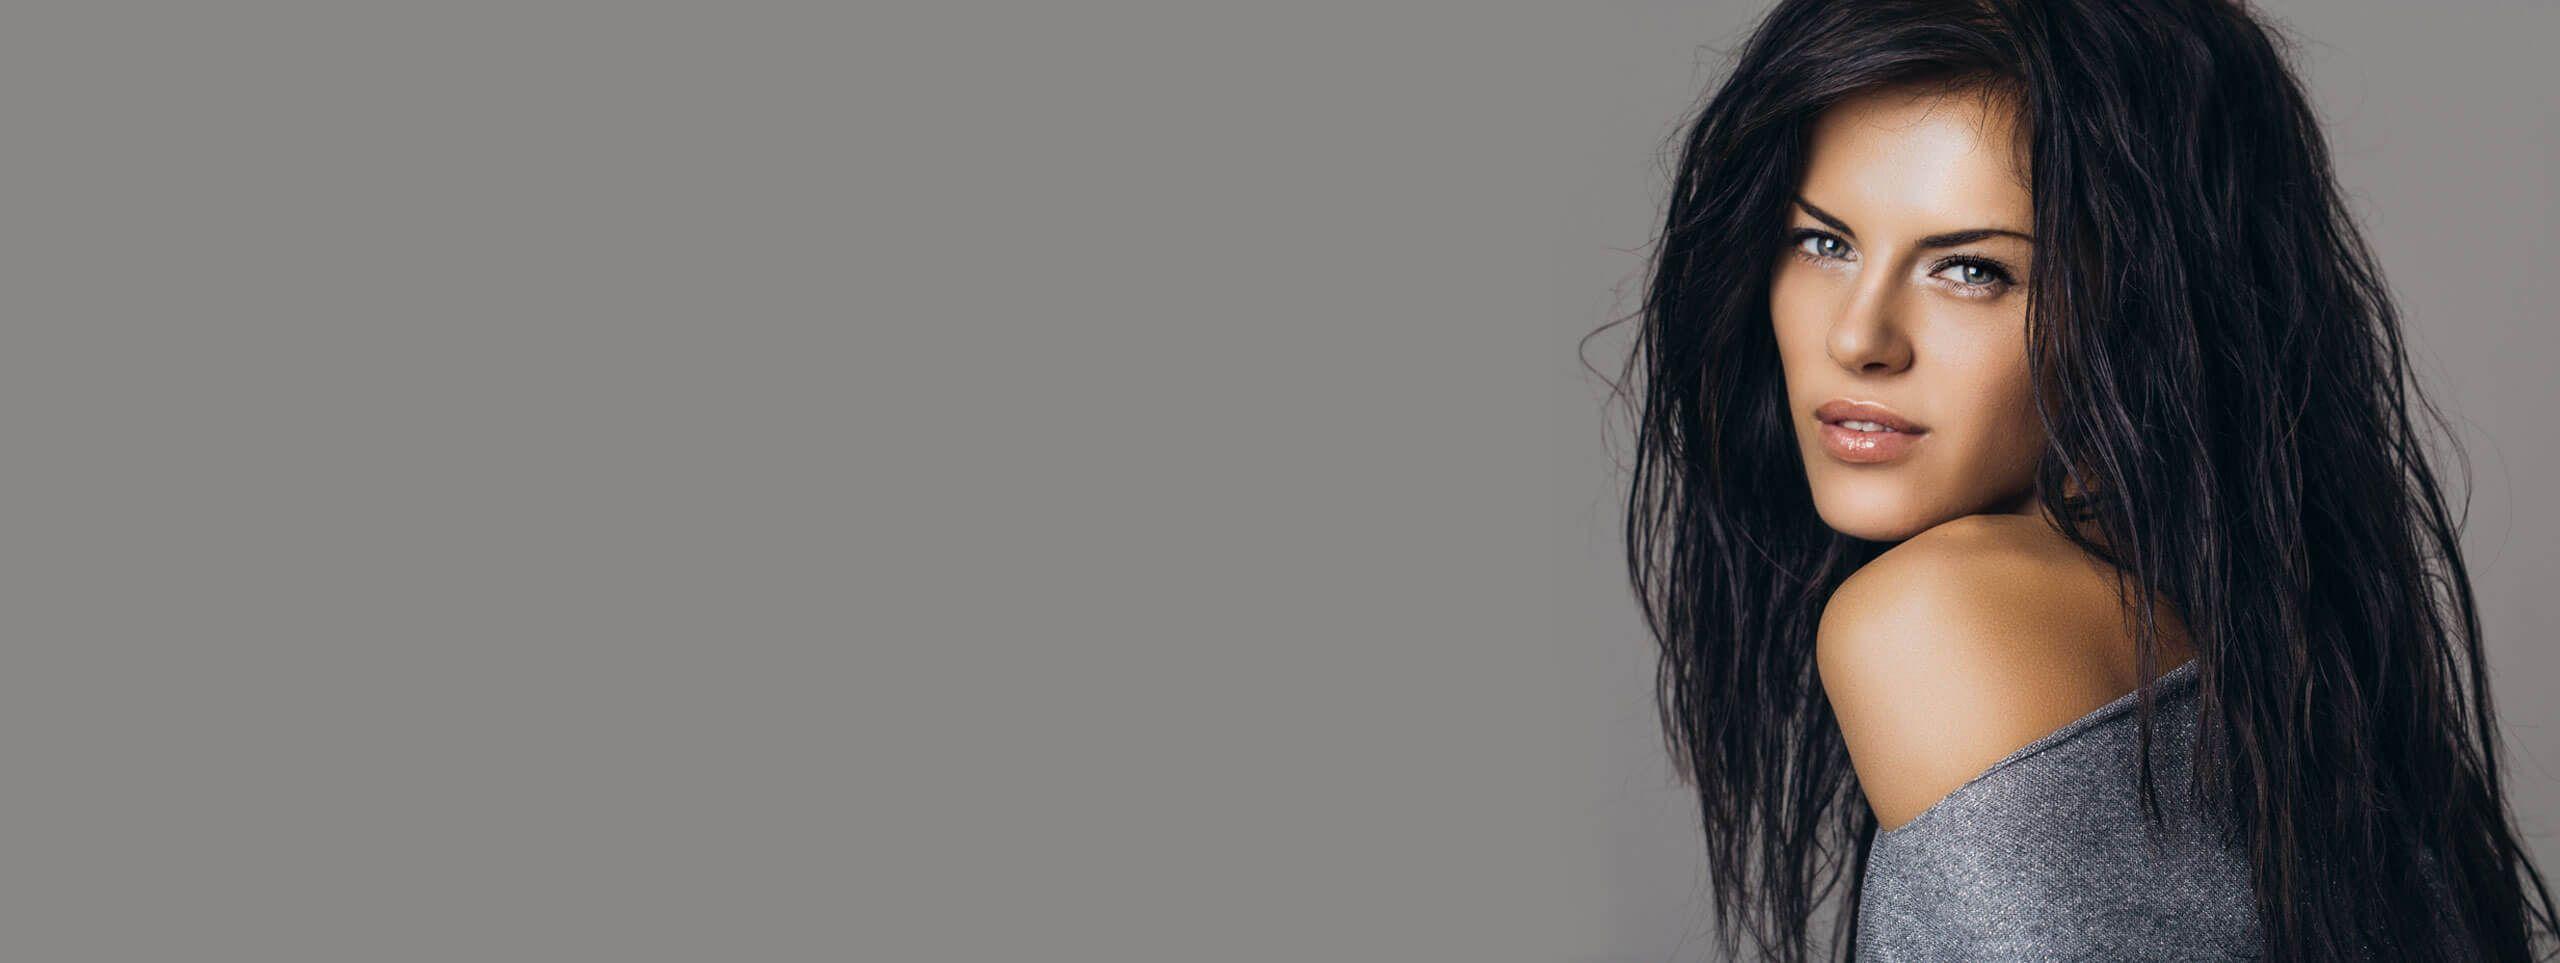 Woman with long black haircolor